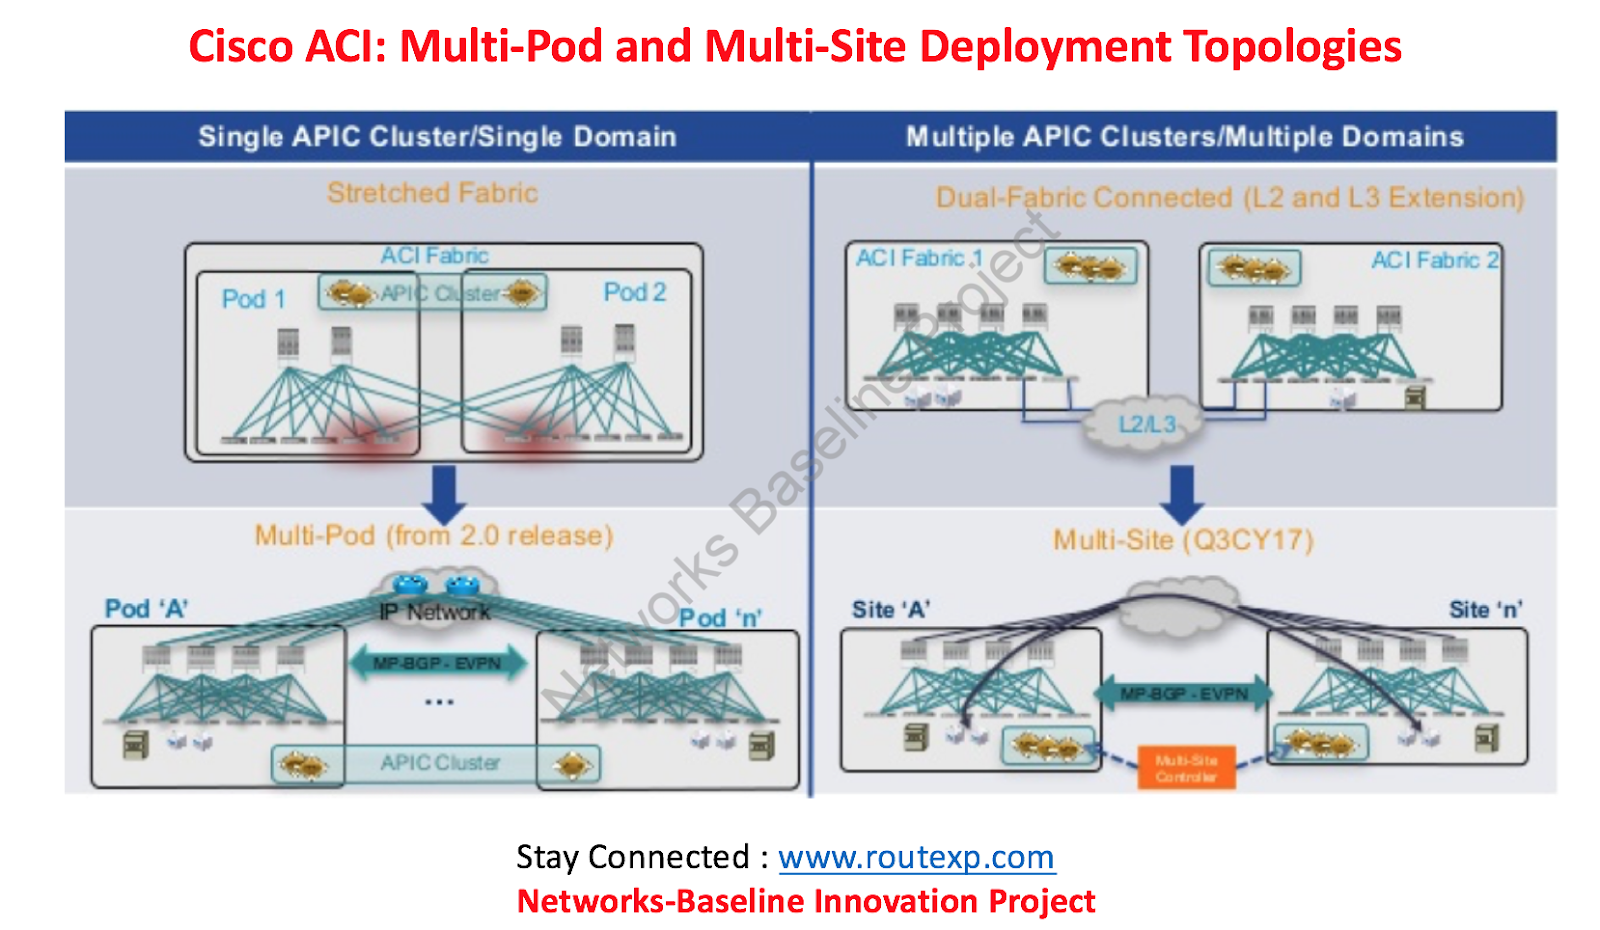 Difference Between Cisco ACI Multi-Pod Vs Cisco ACI Multi-Site